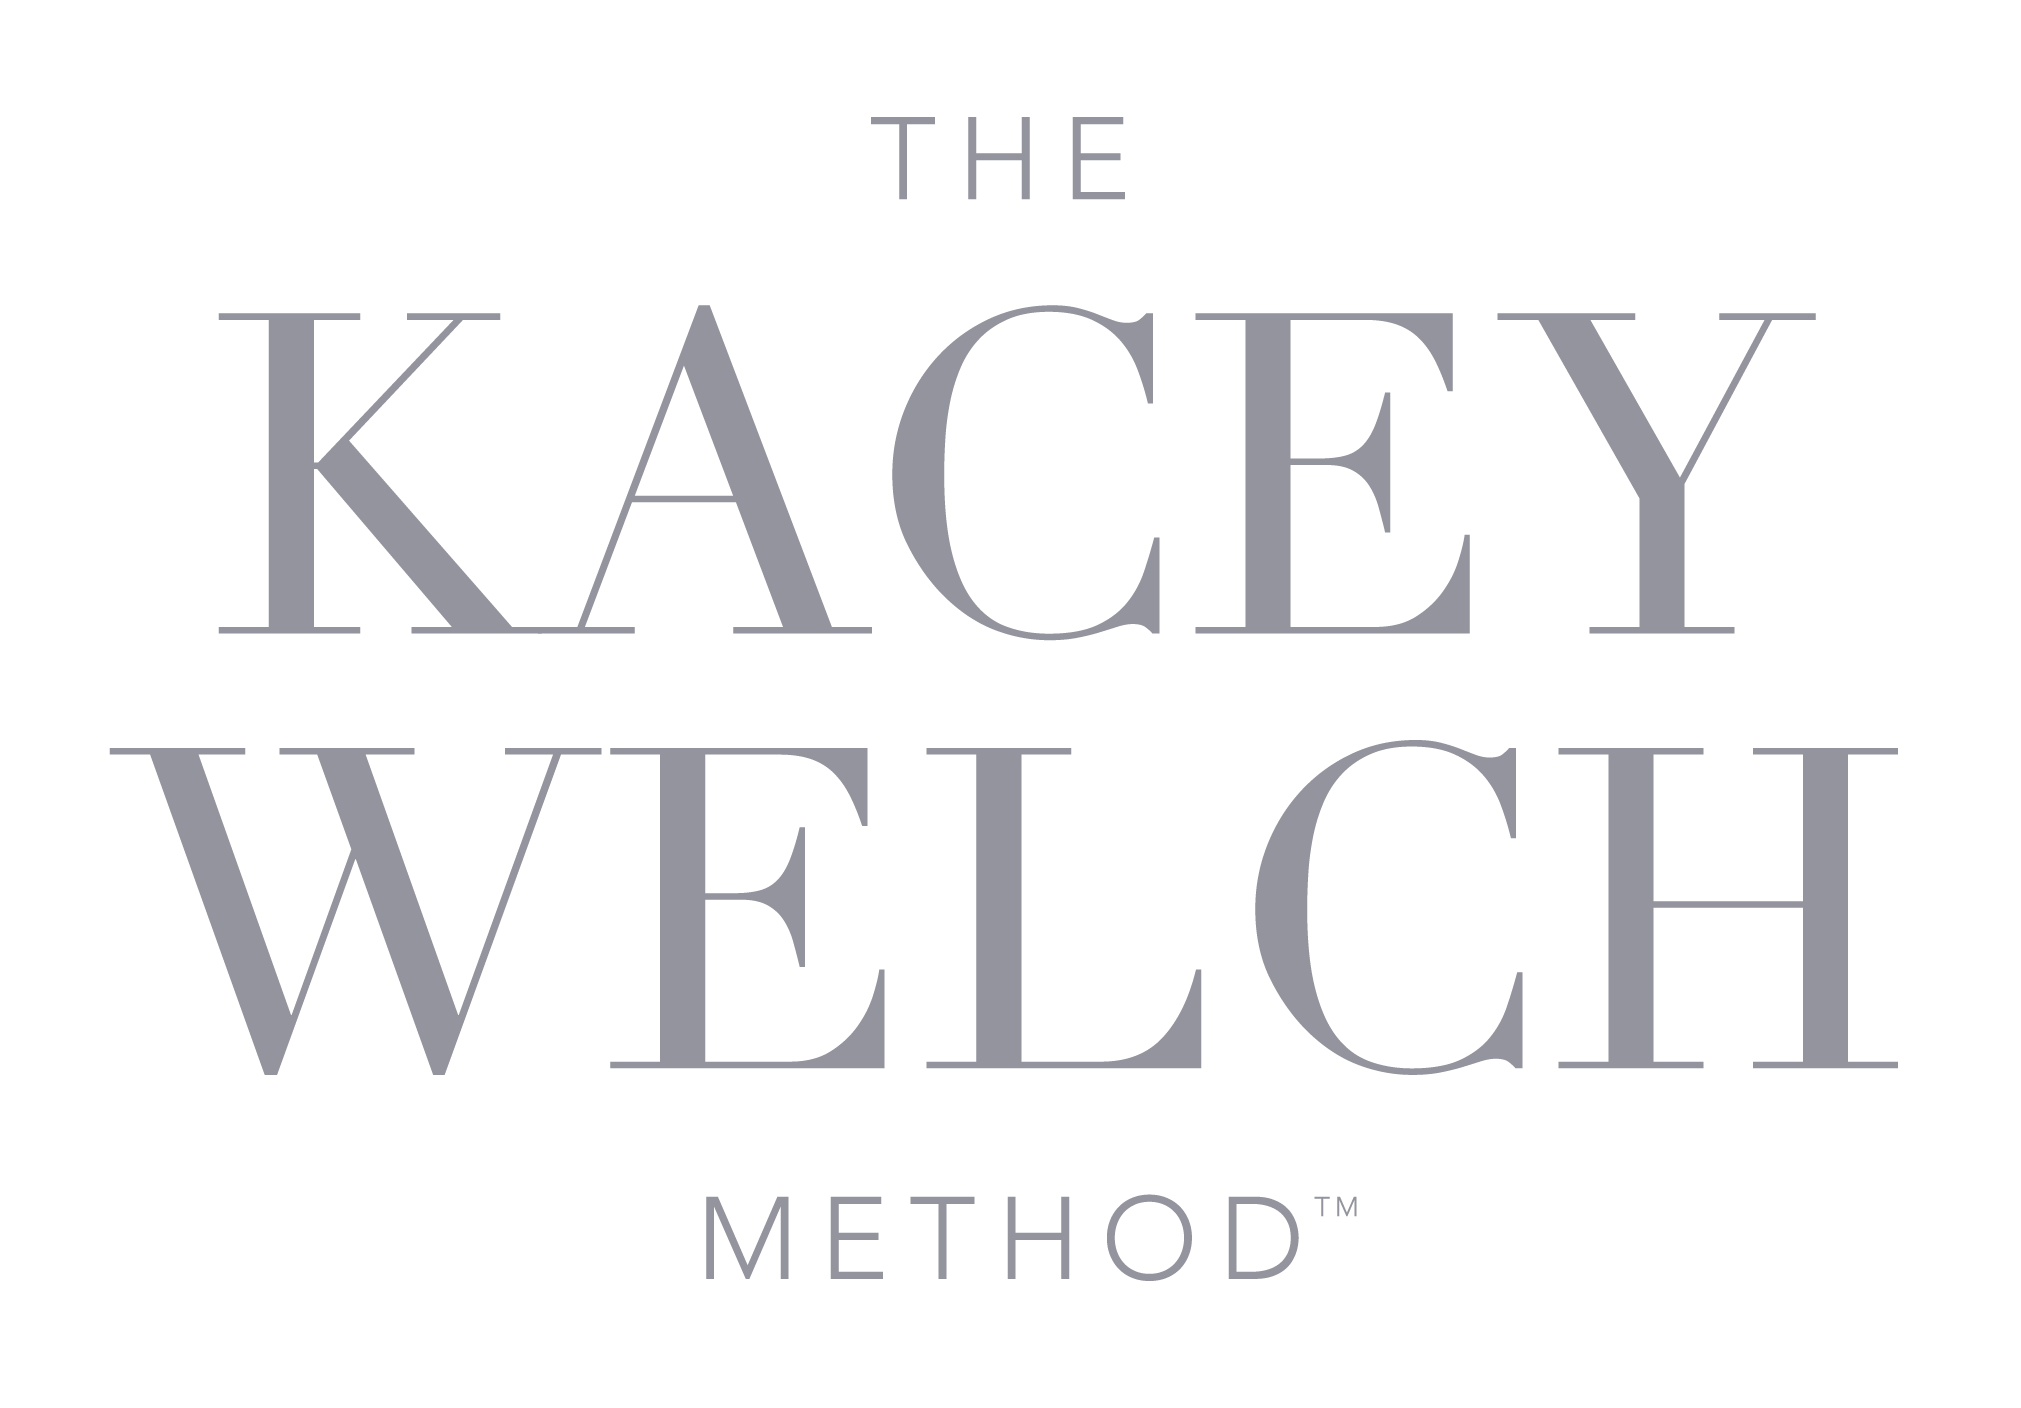 011719Kacey Welch Logo Dark Purple OL.png